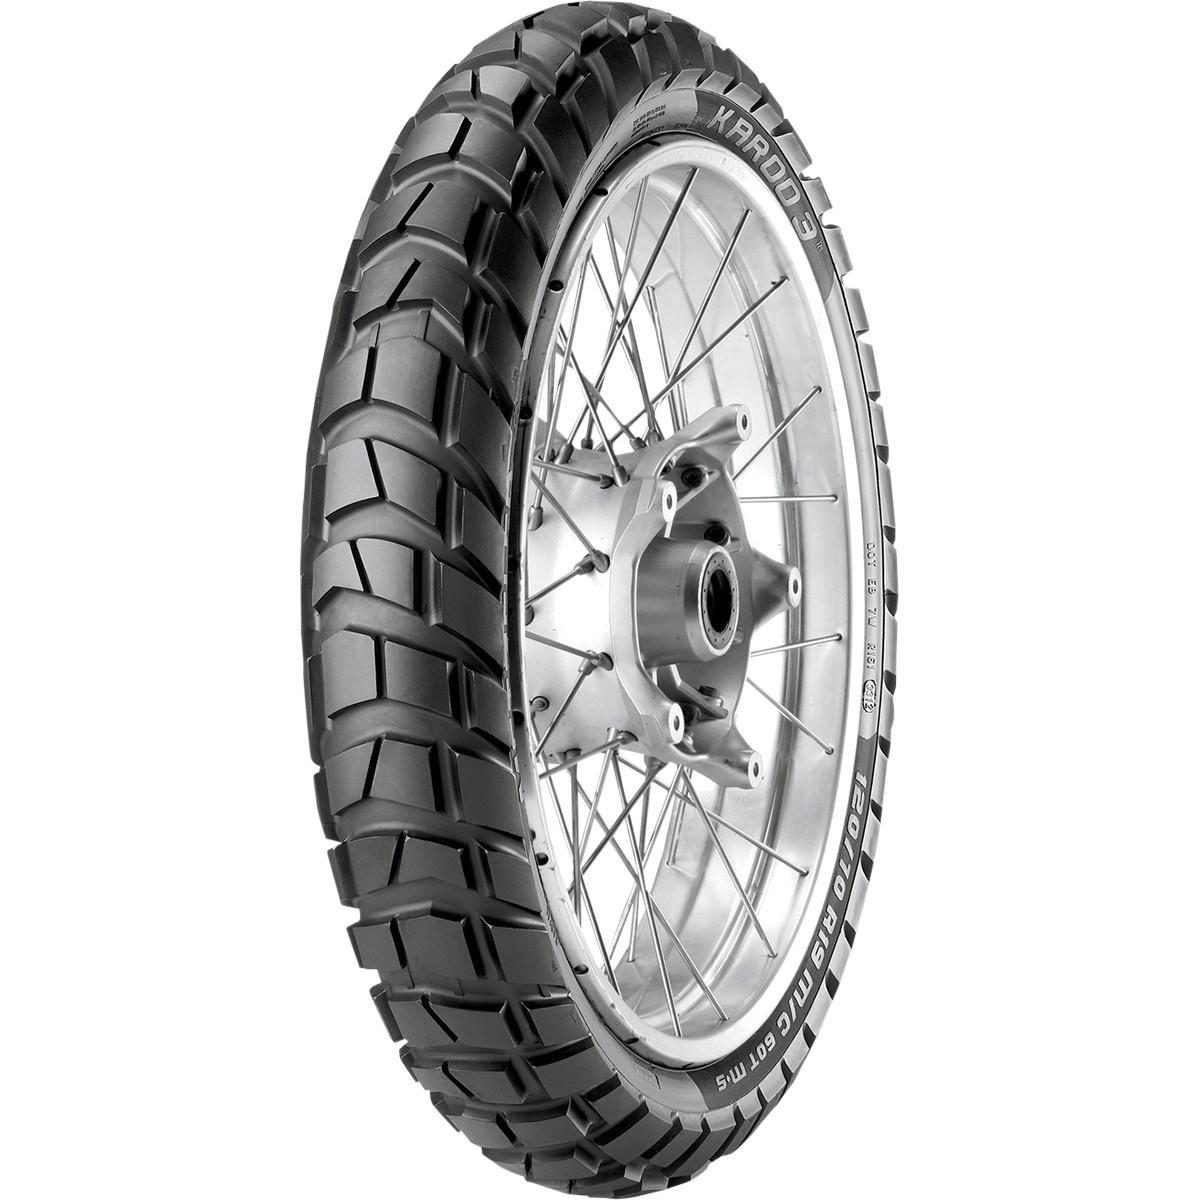 Metzeler Karoo 3 Front Tire 90//90-21 TL